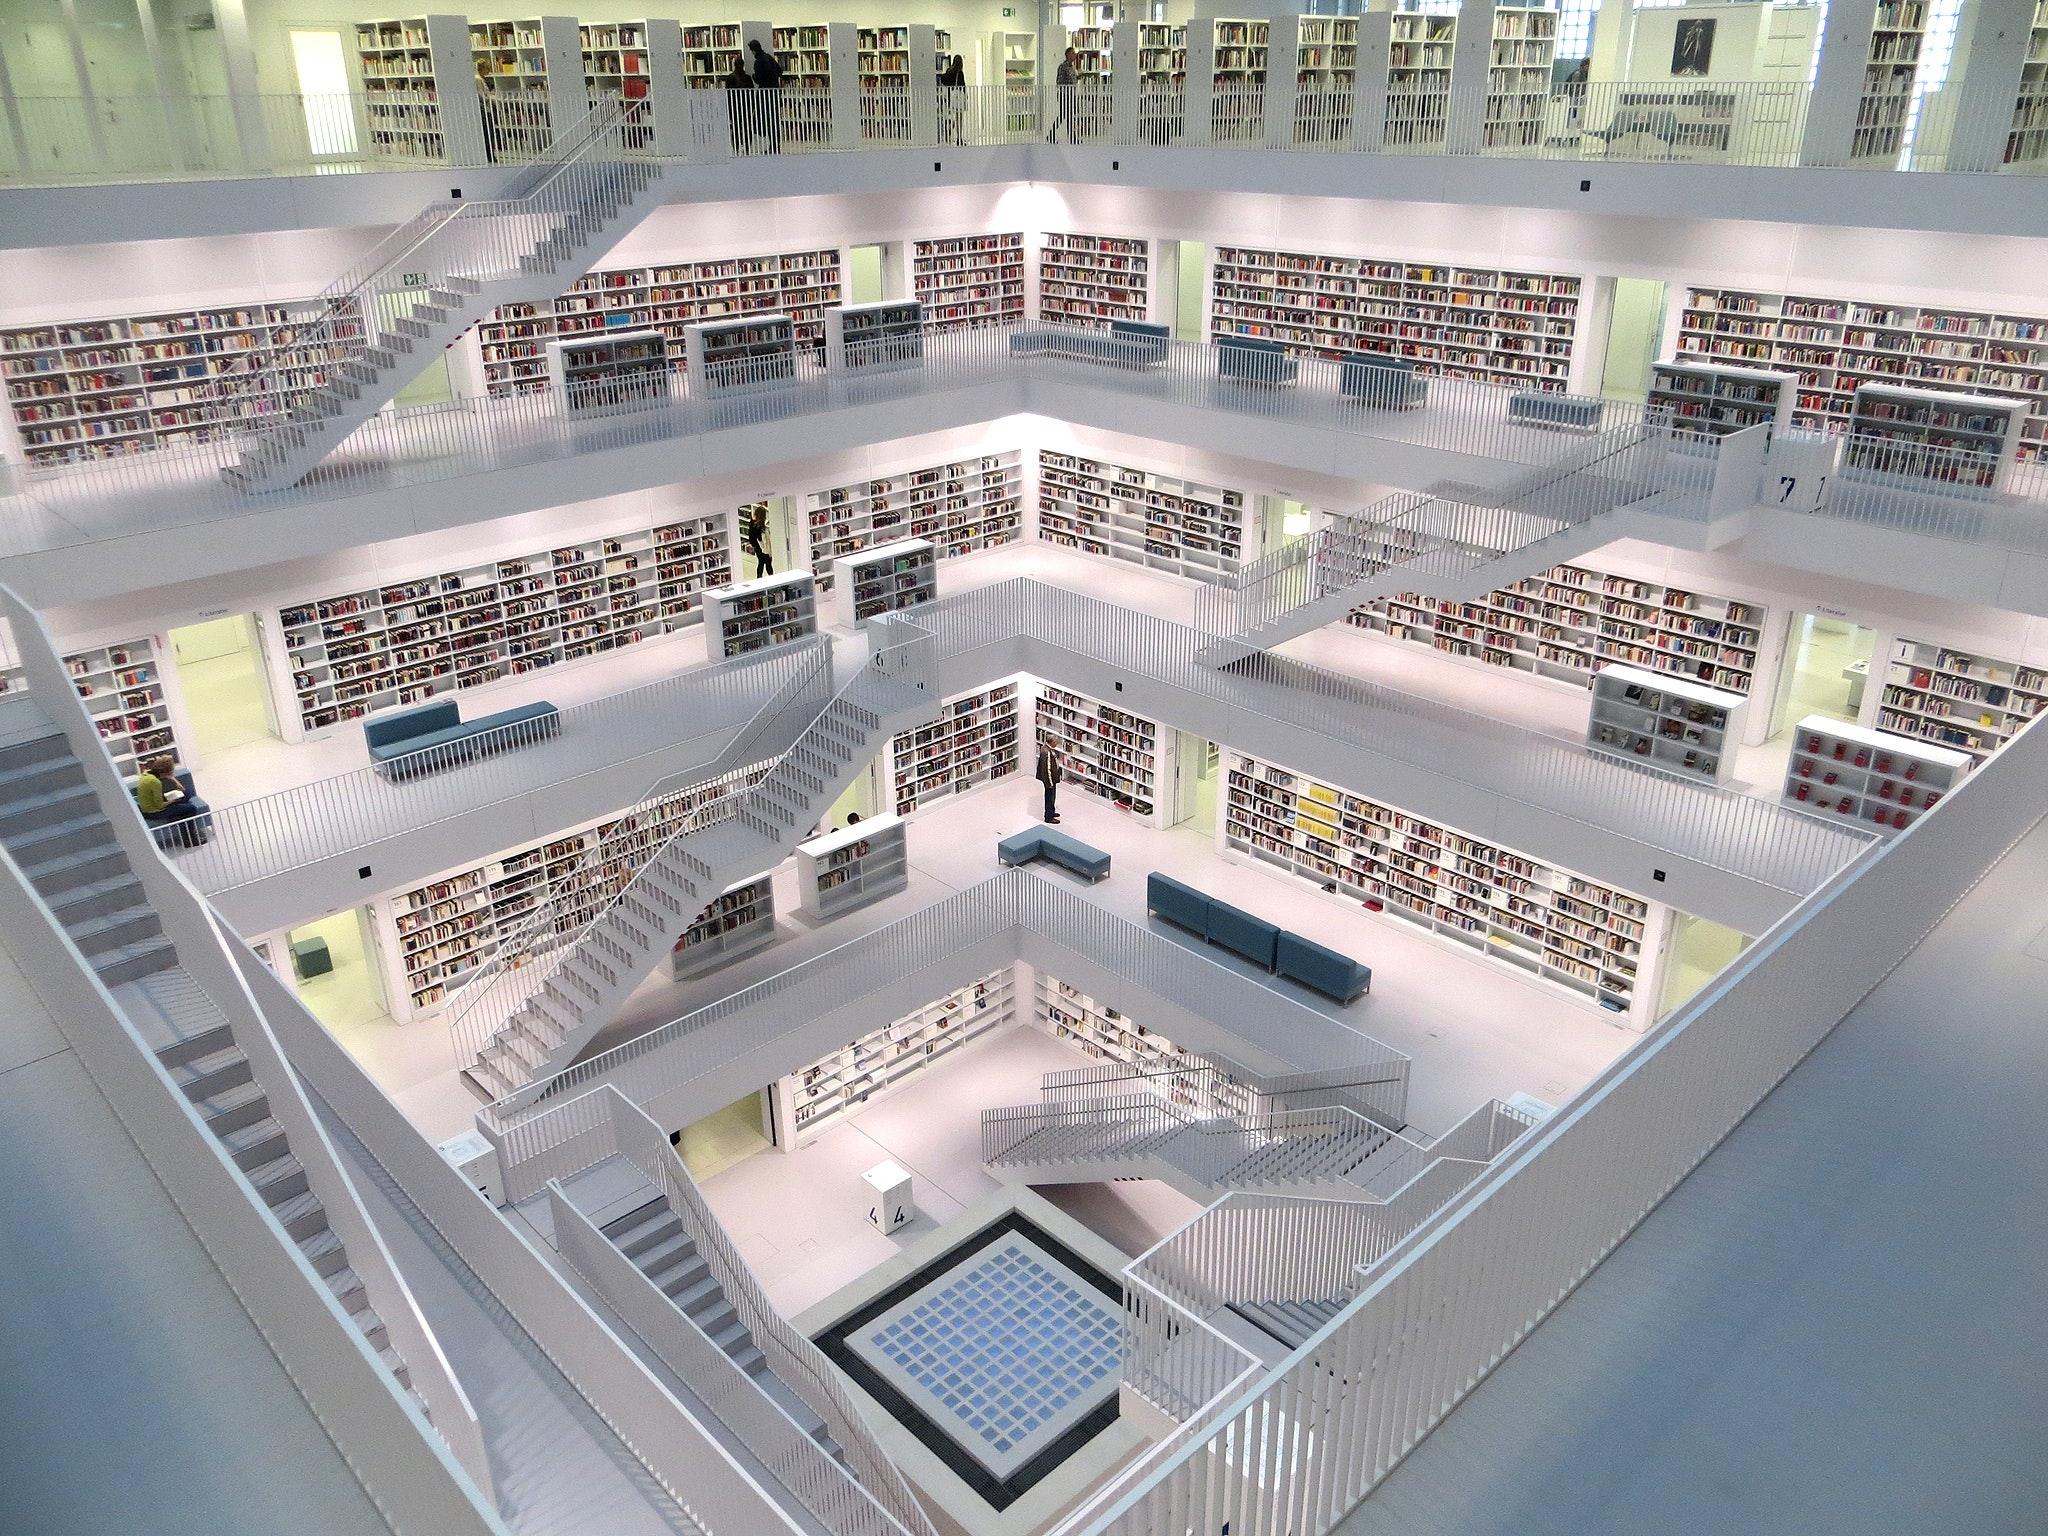 books_architecture.jpg